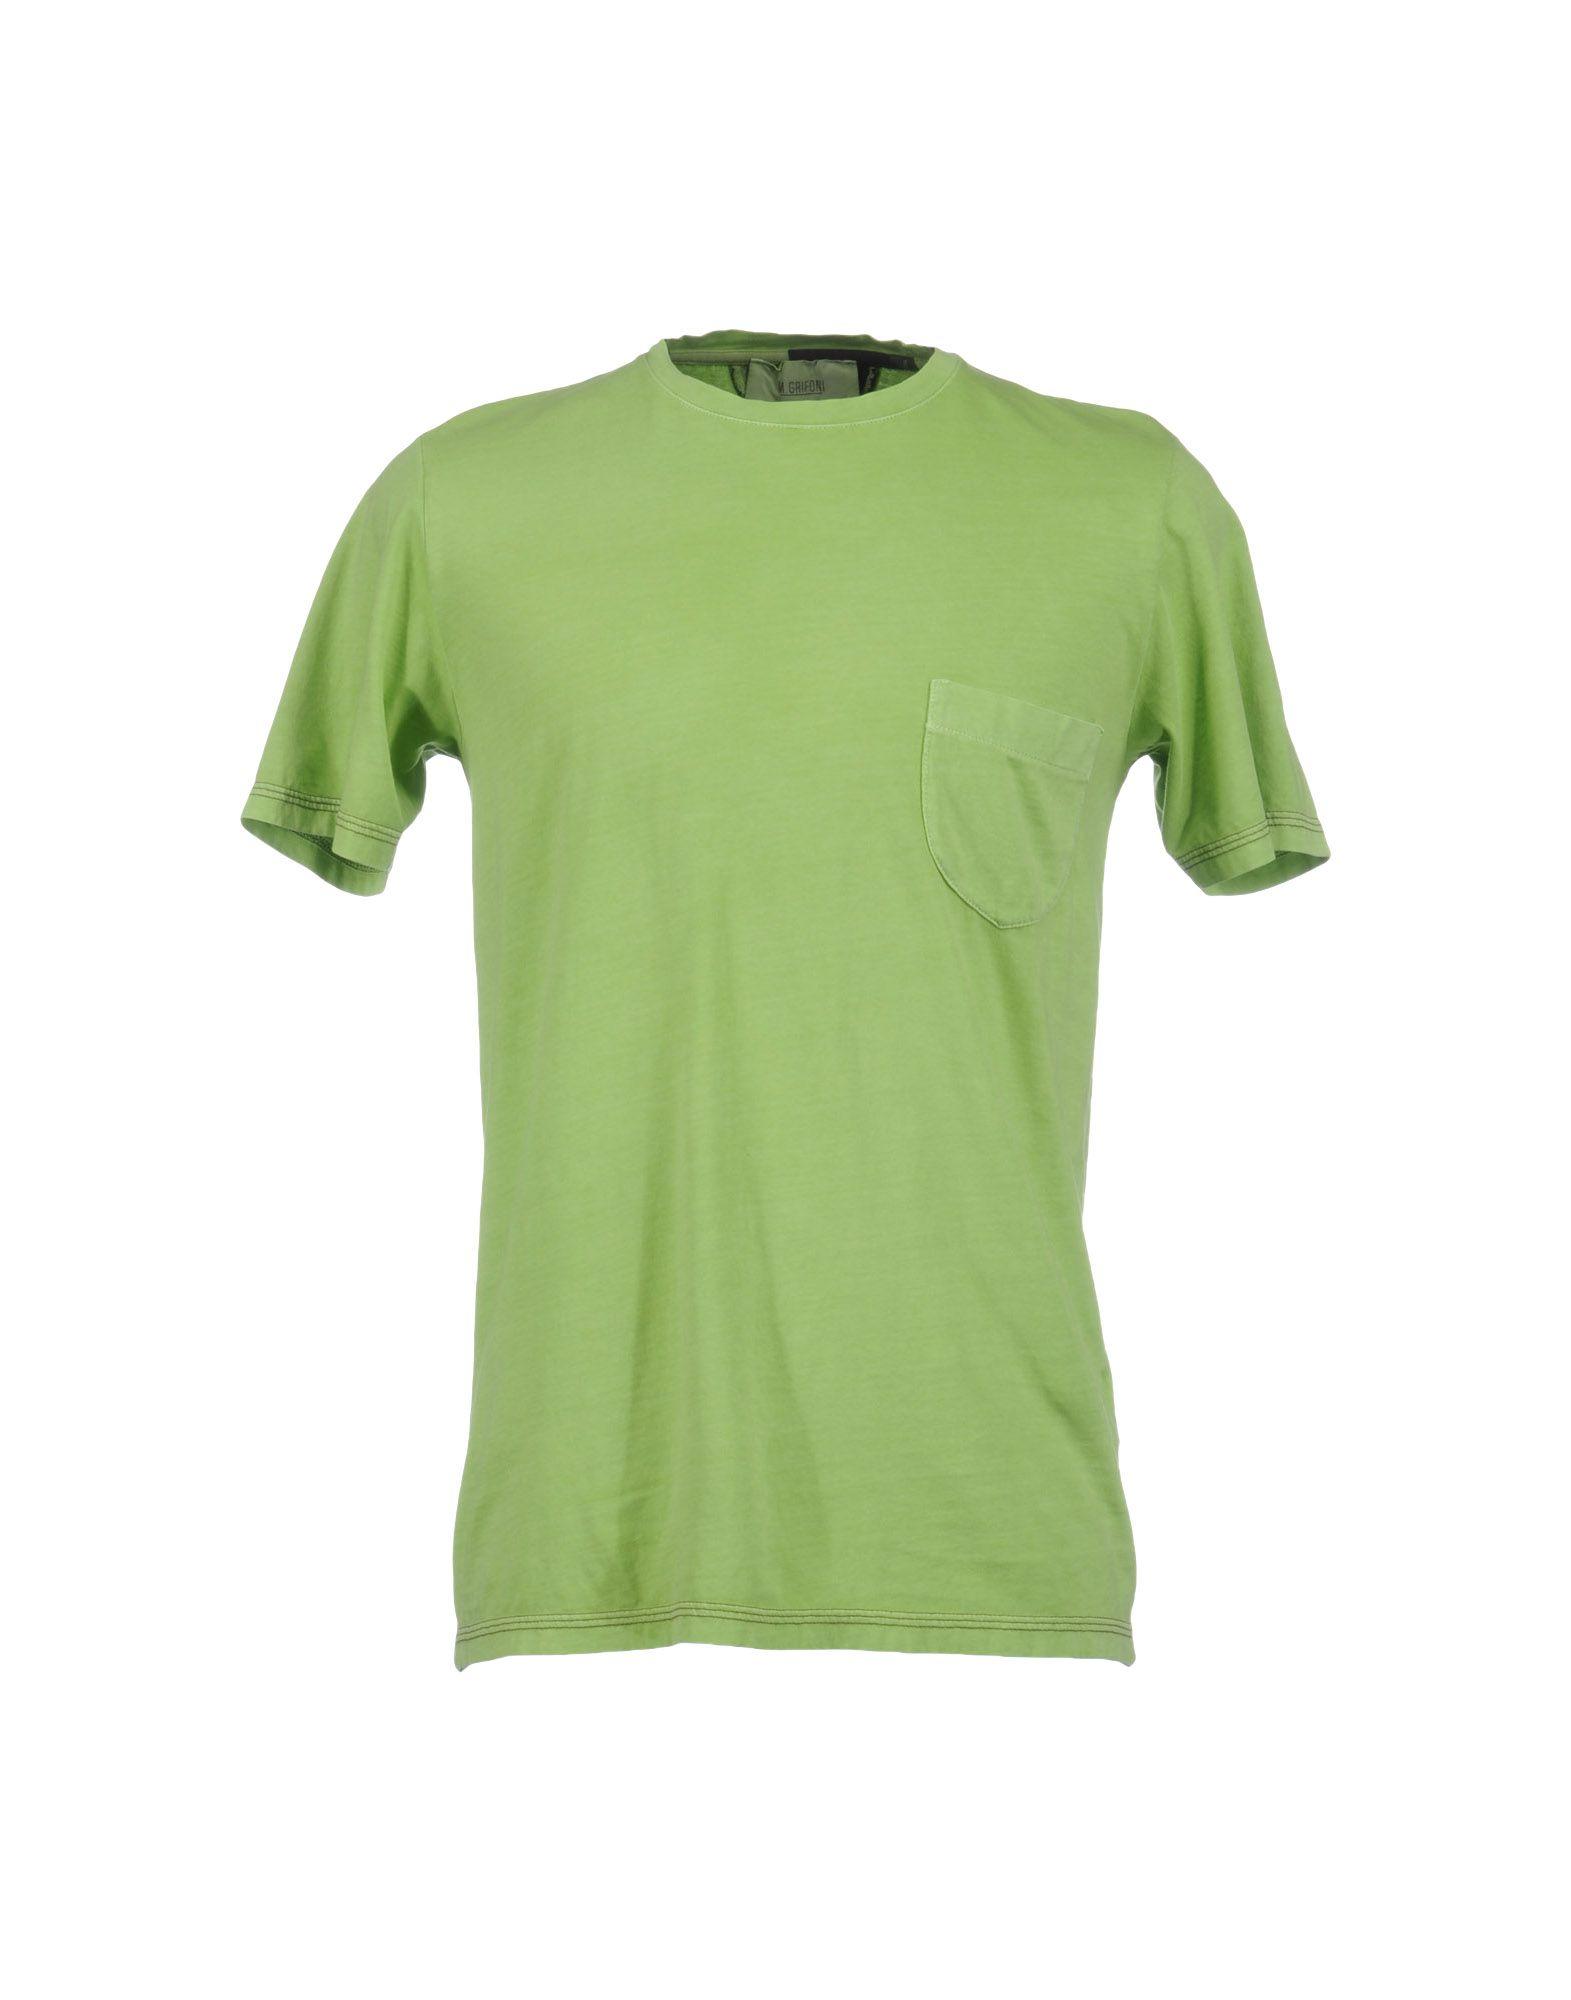 MAURO GRIFONI Футболка с короткими рукавами футболка поло большого размера с короткими рукавами